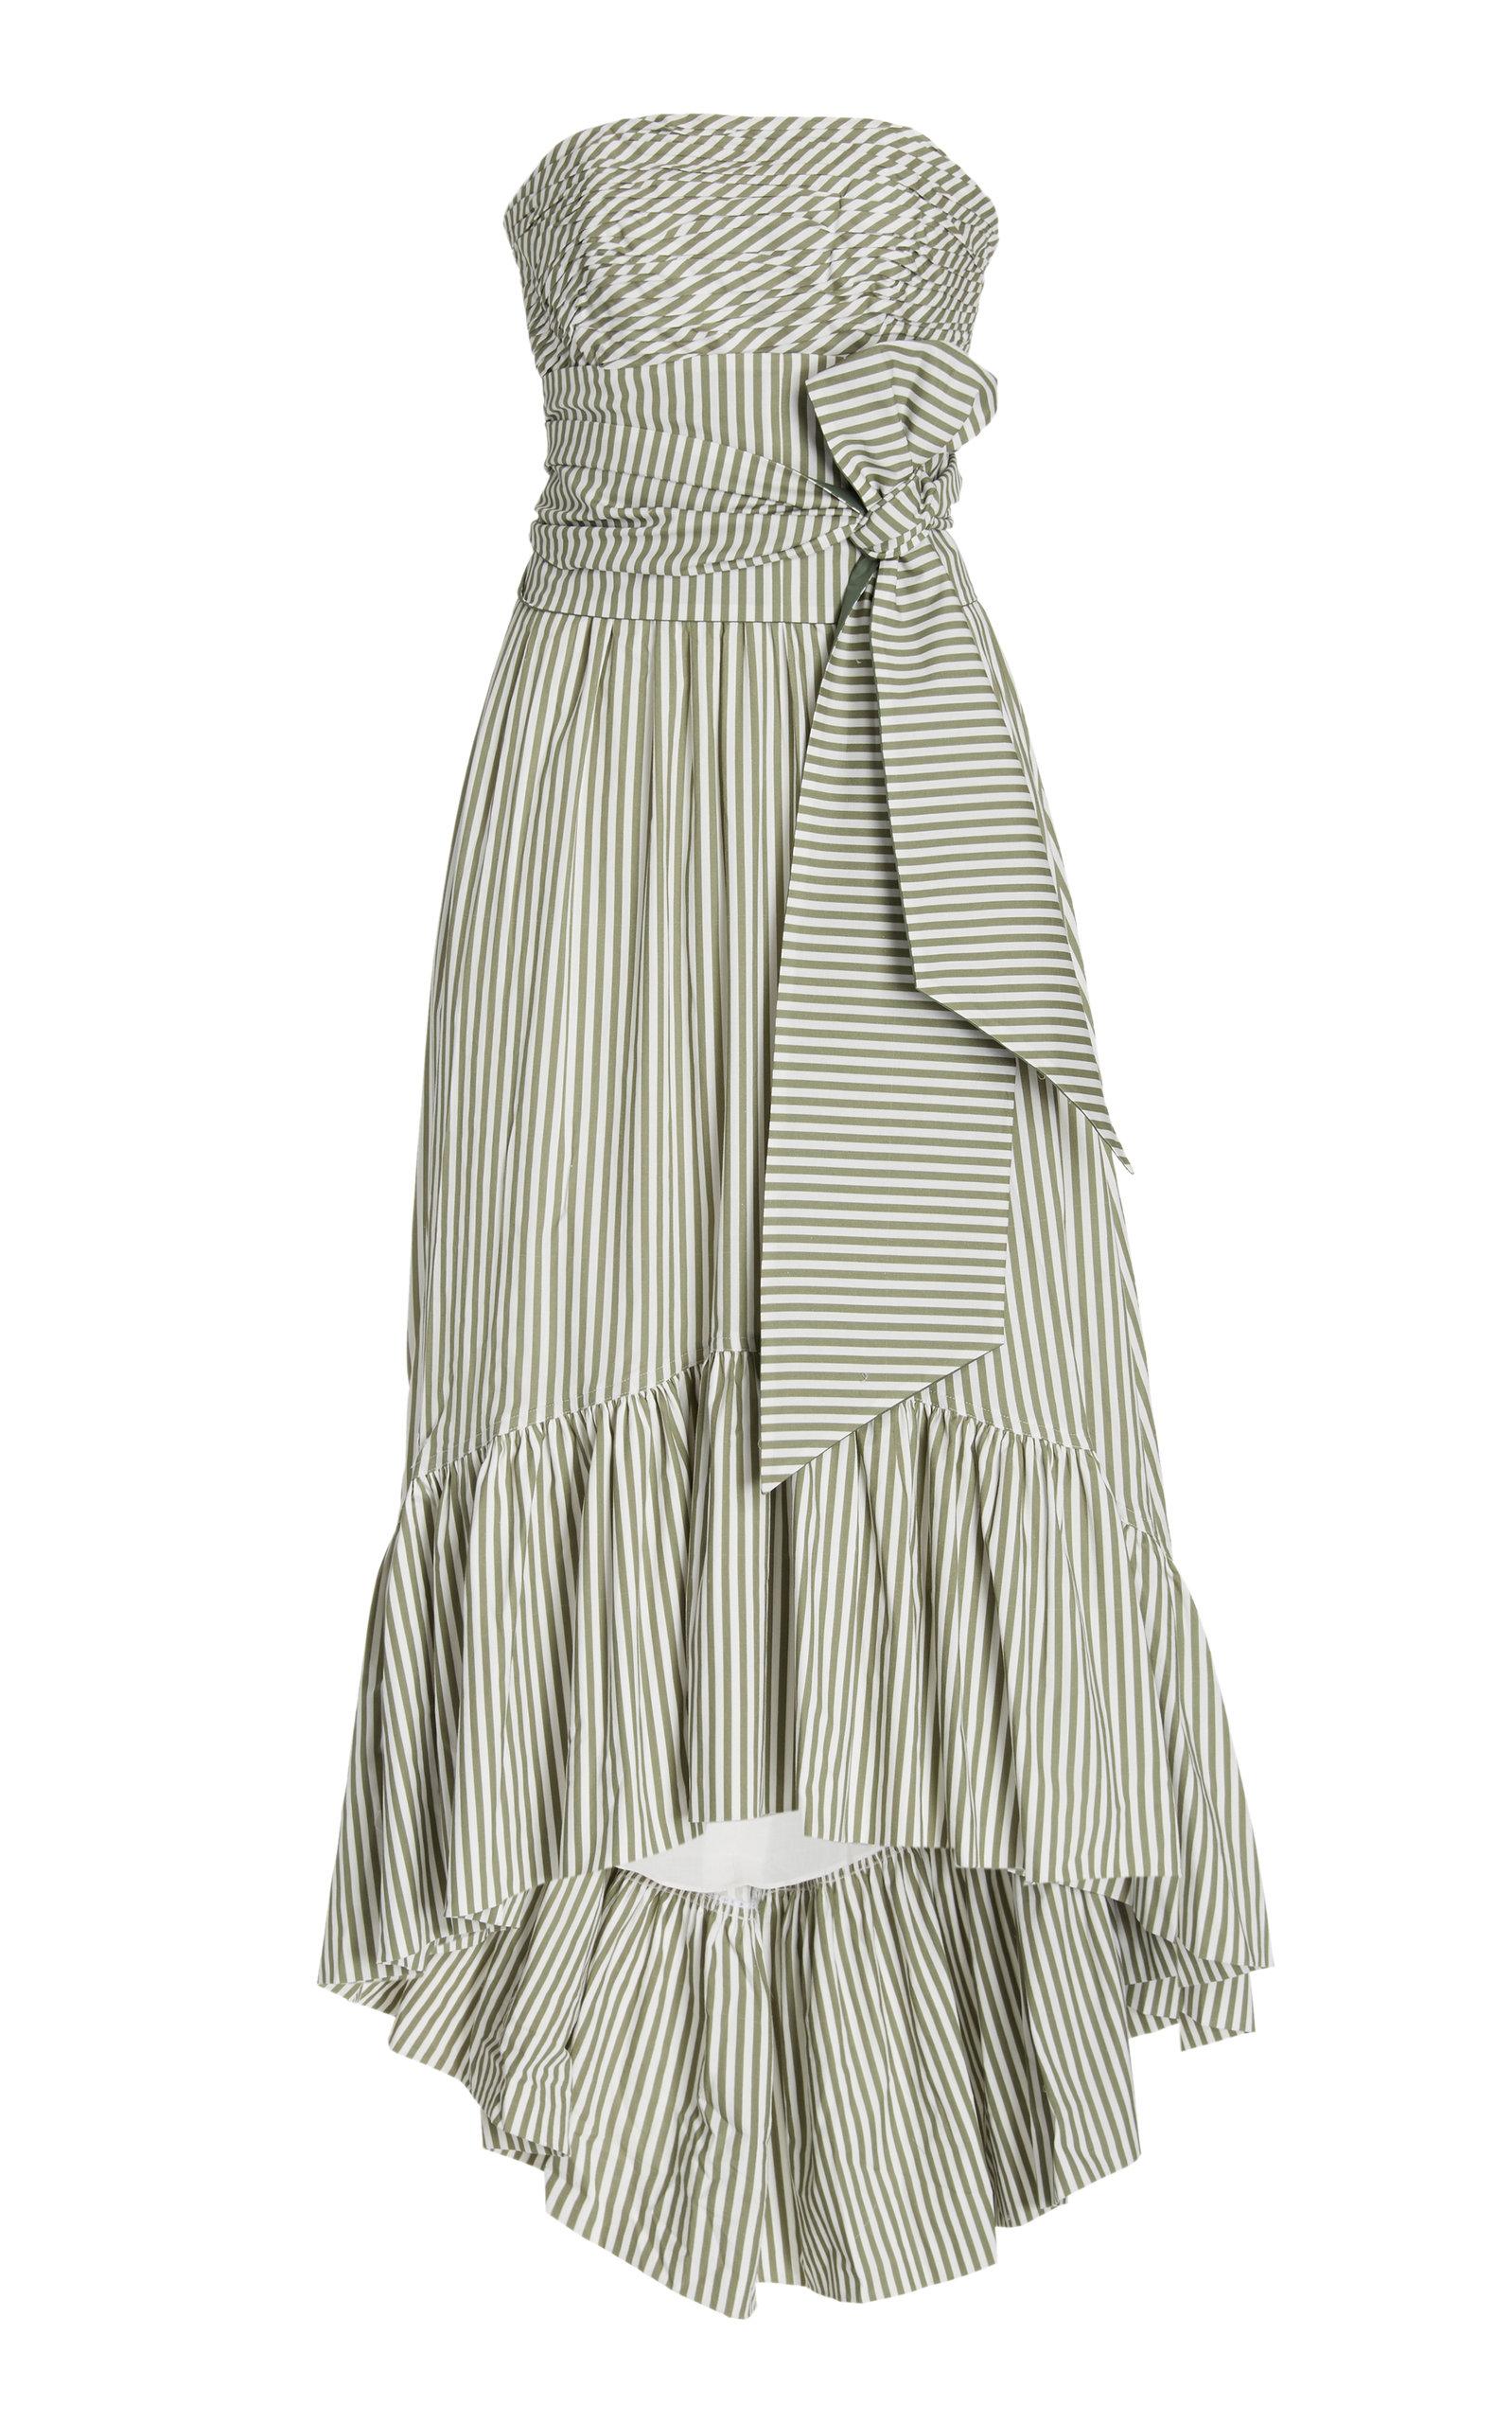 Women's Caiman Belted Striped Cotton Strapless Maxi Dress